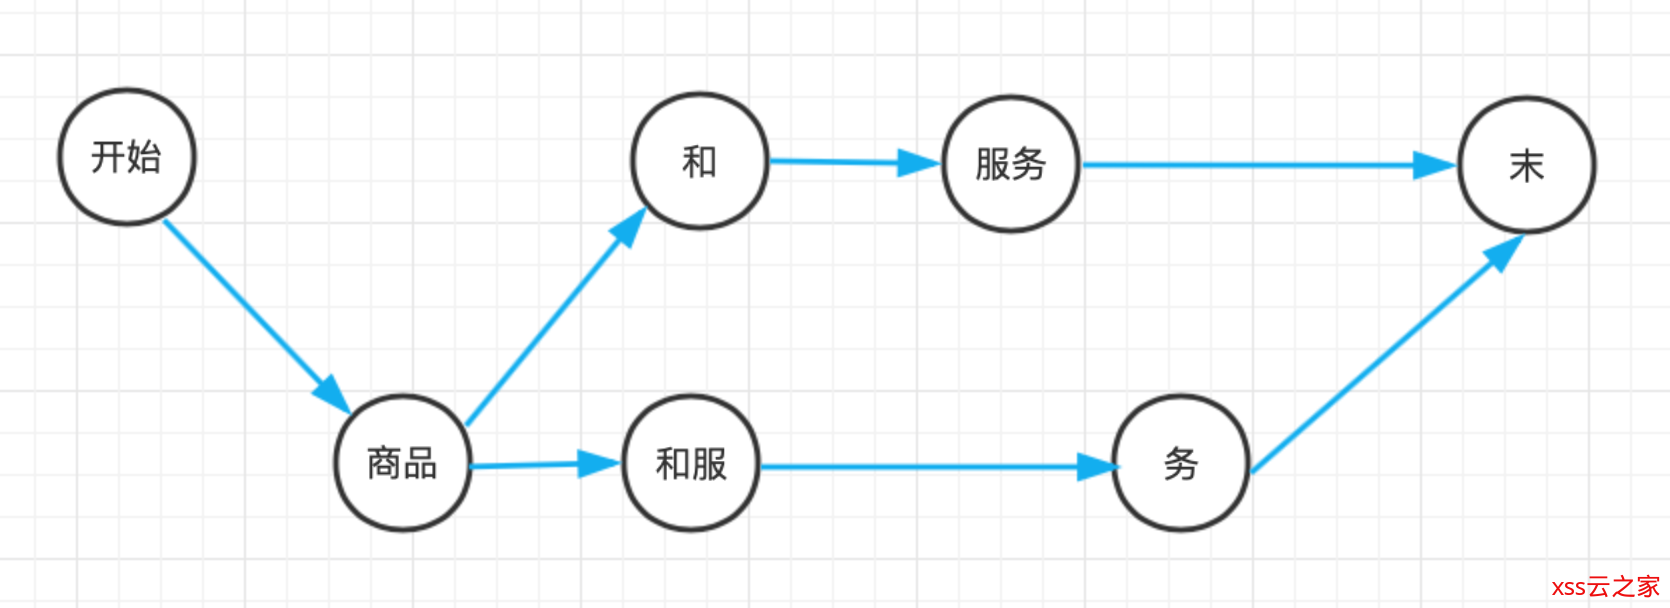 HanLP《自然语言处理入门》笔记--3.二元语法与中文分词